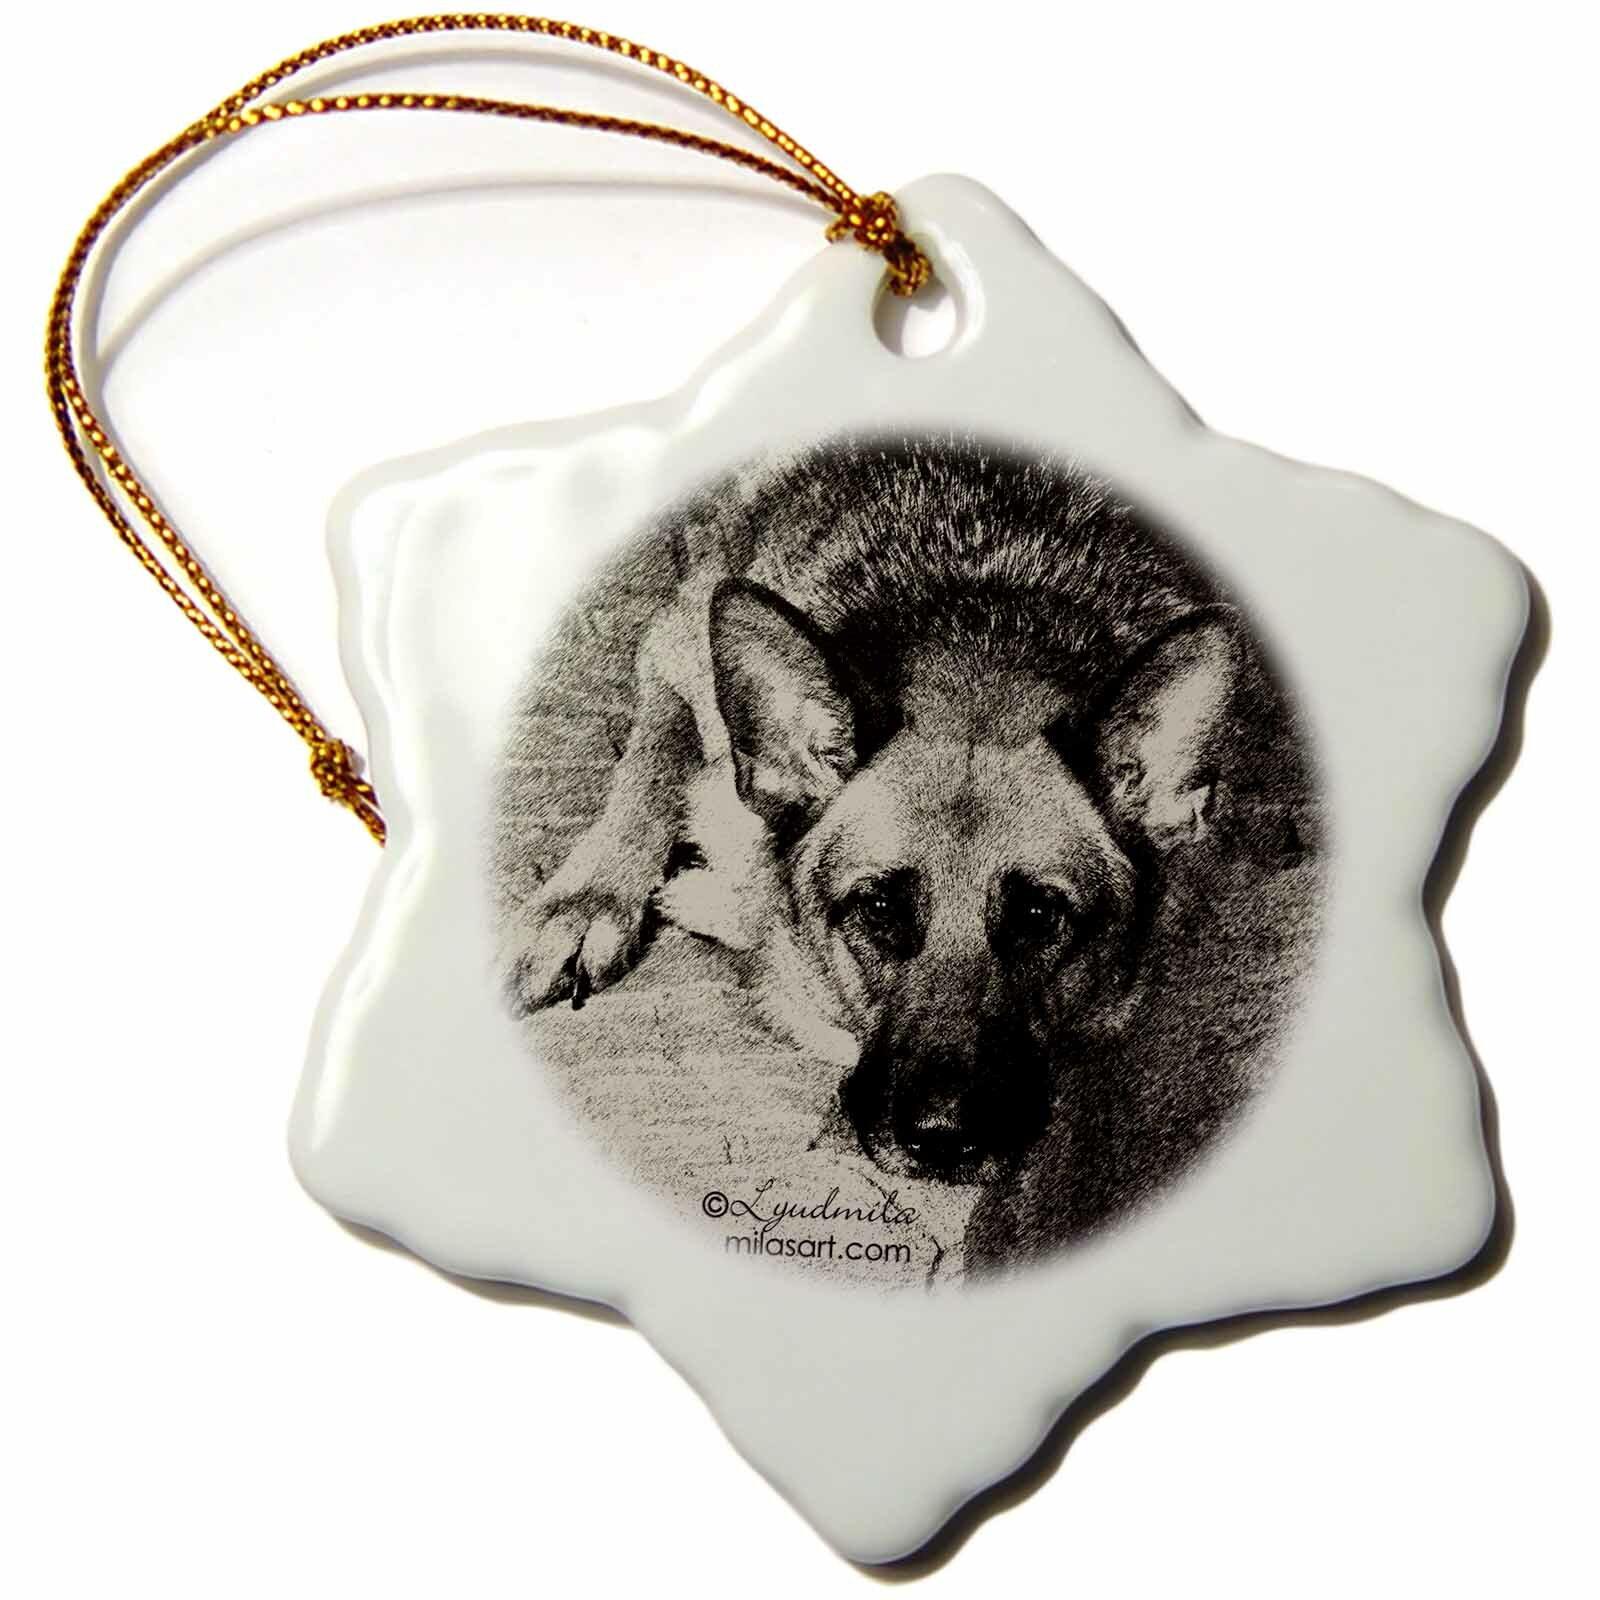 The Holiday Aisle German Shepherd Holiday Shaped Ornament Wayfair